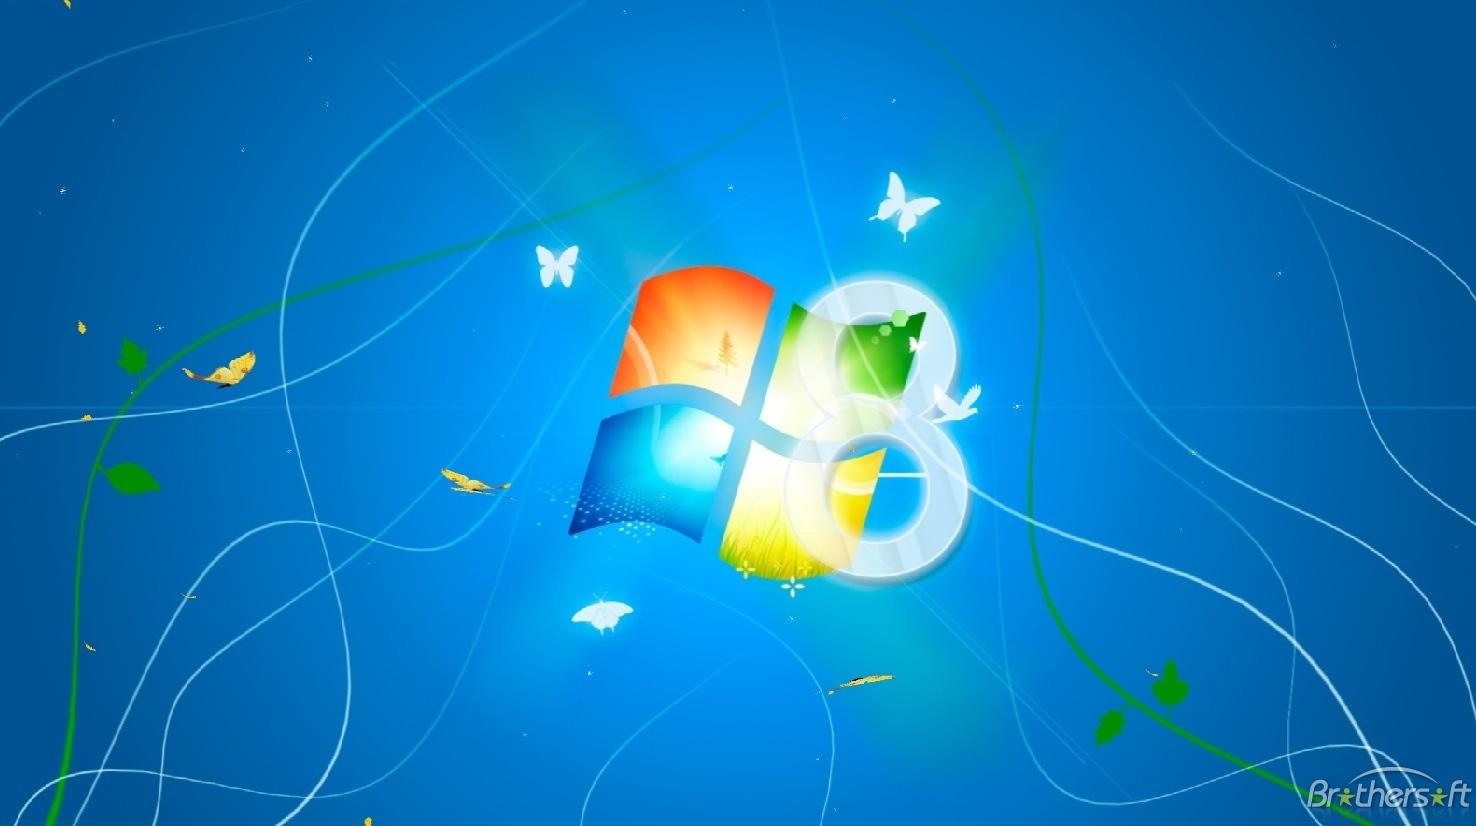 Active Wallpaper Windows 7 WallpaperSafari